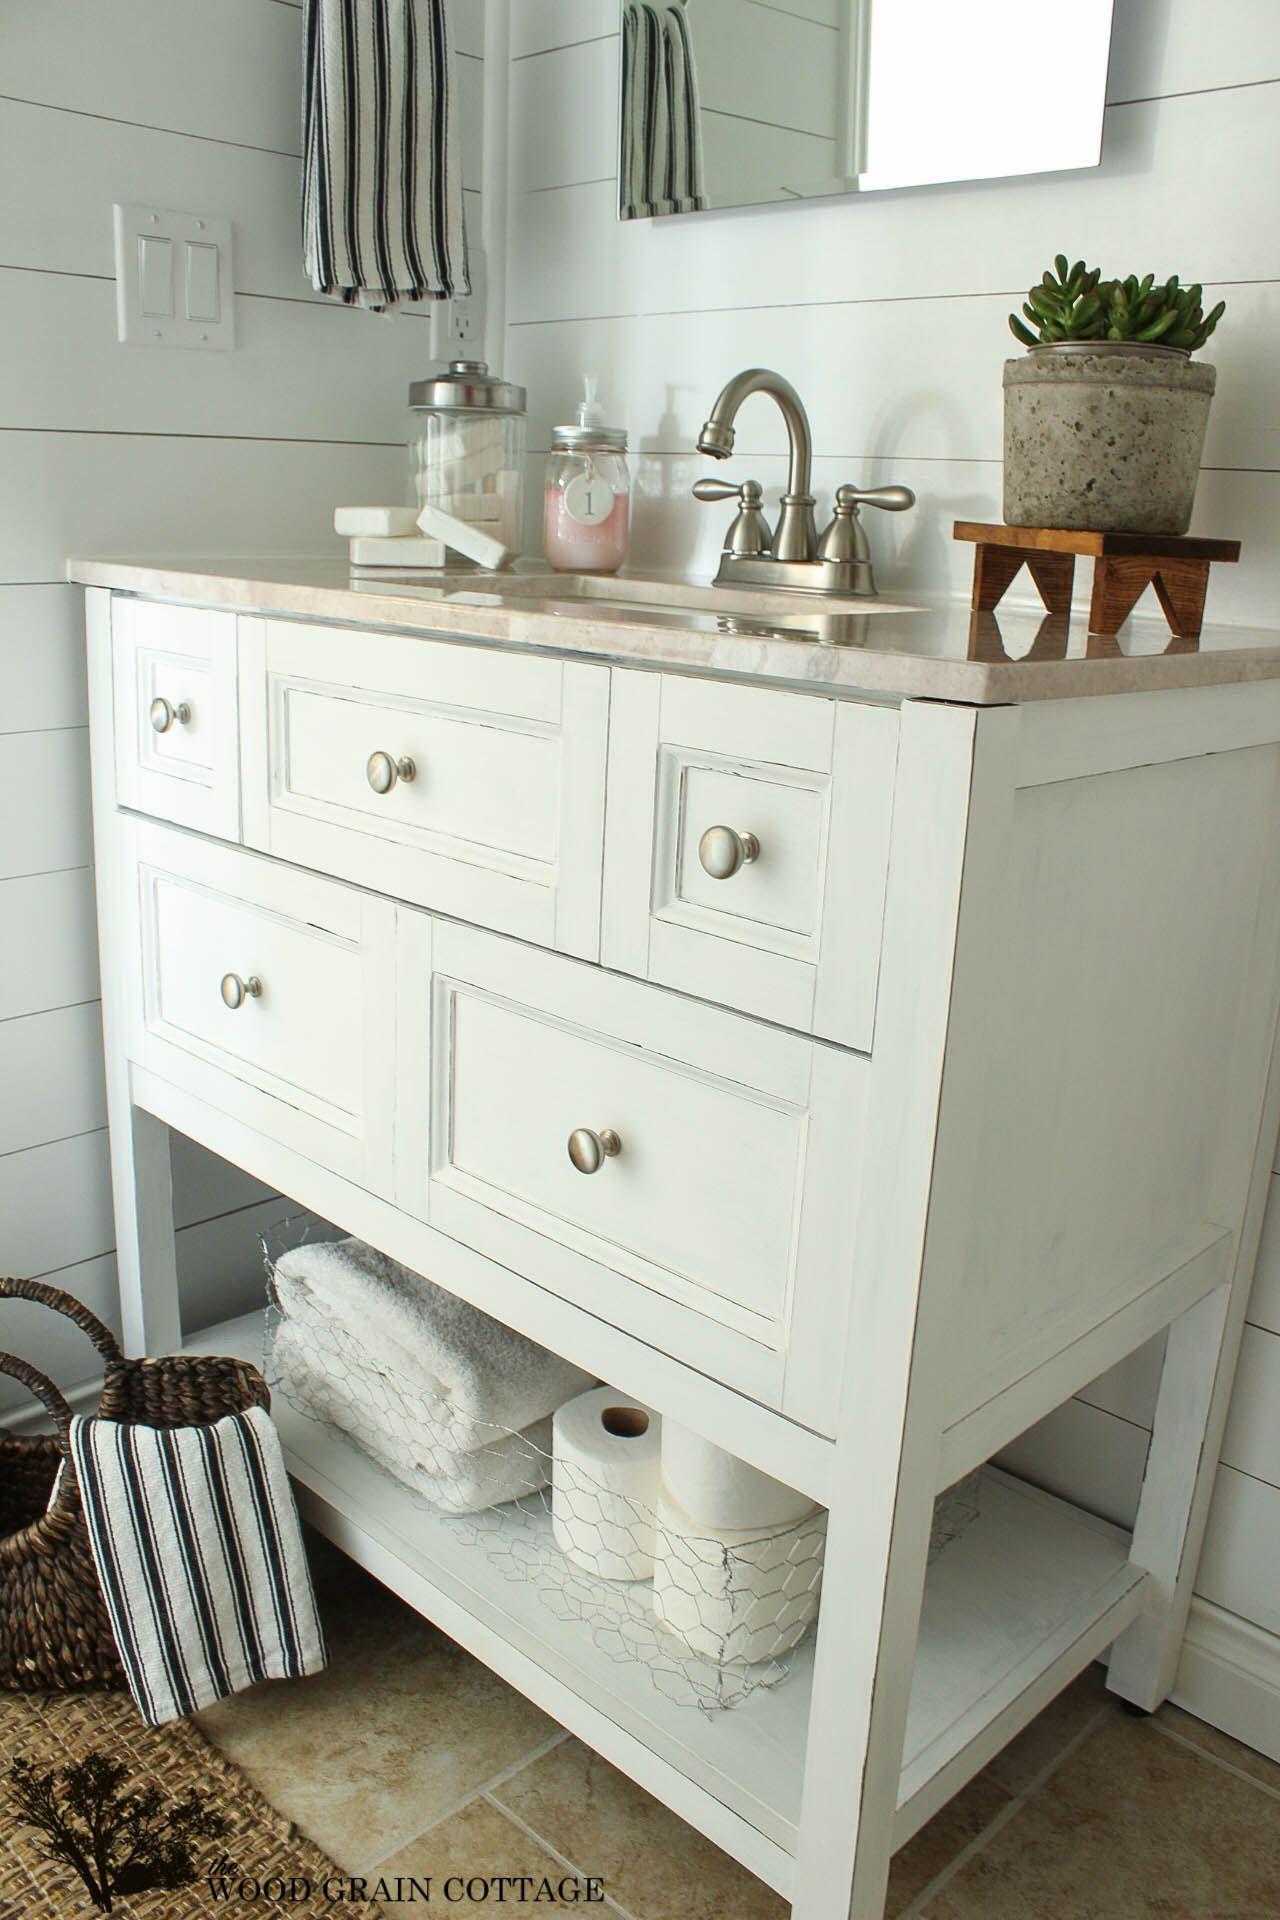 Basement Finishing Ideas: Open Bathroom Vanity With Baskets On Shelf For  Storage